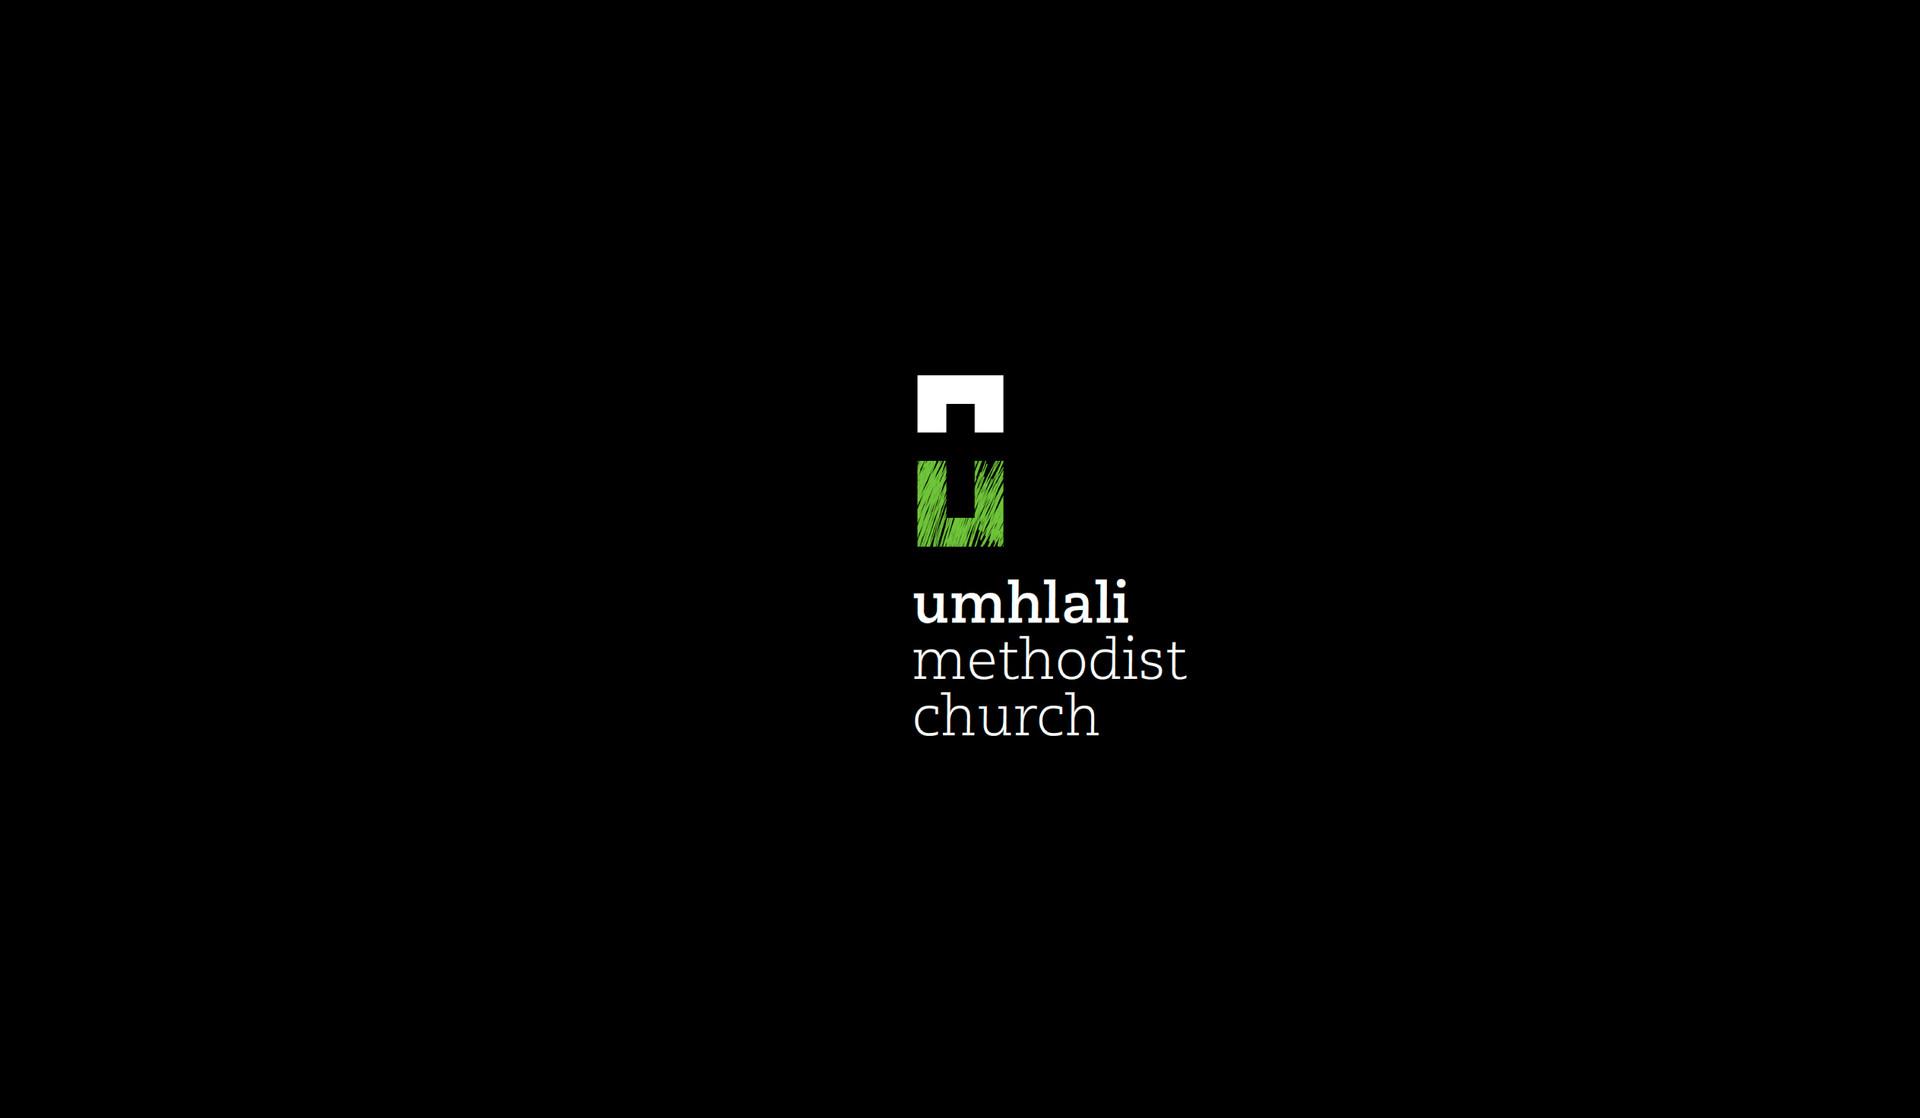 Umhlali-Methodist-Church-logo-design-01.